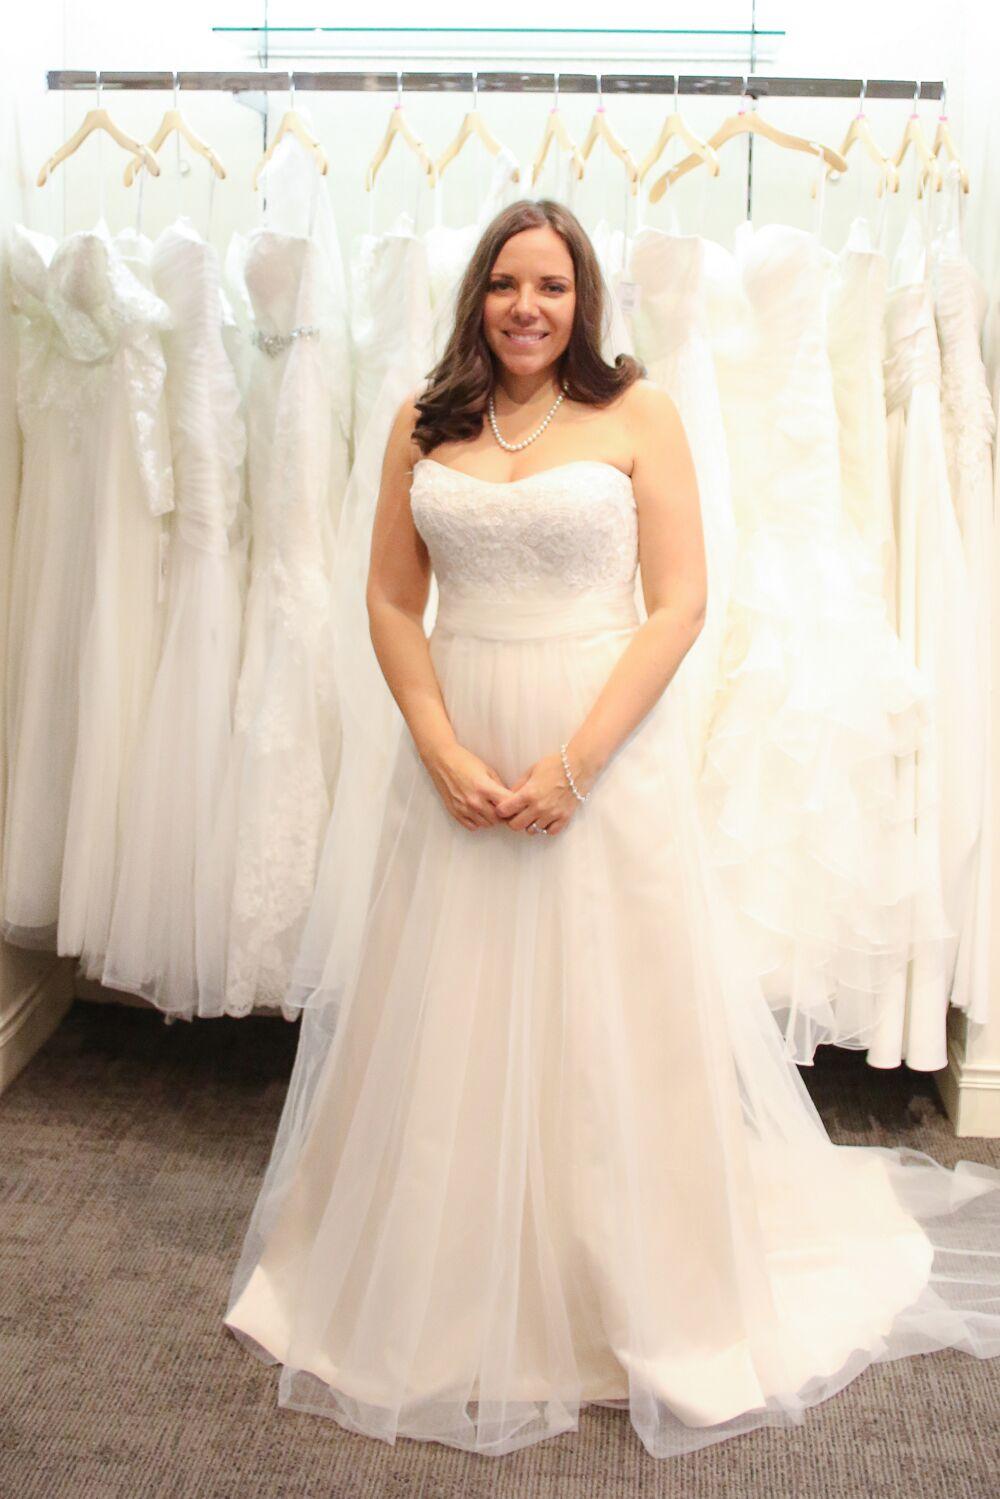 davids bridal january sale-Look 2